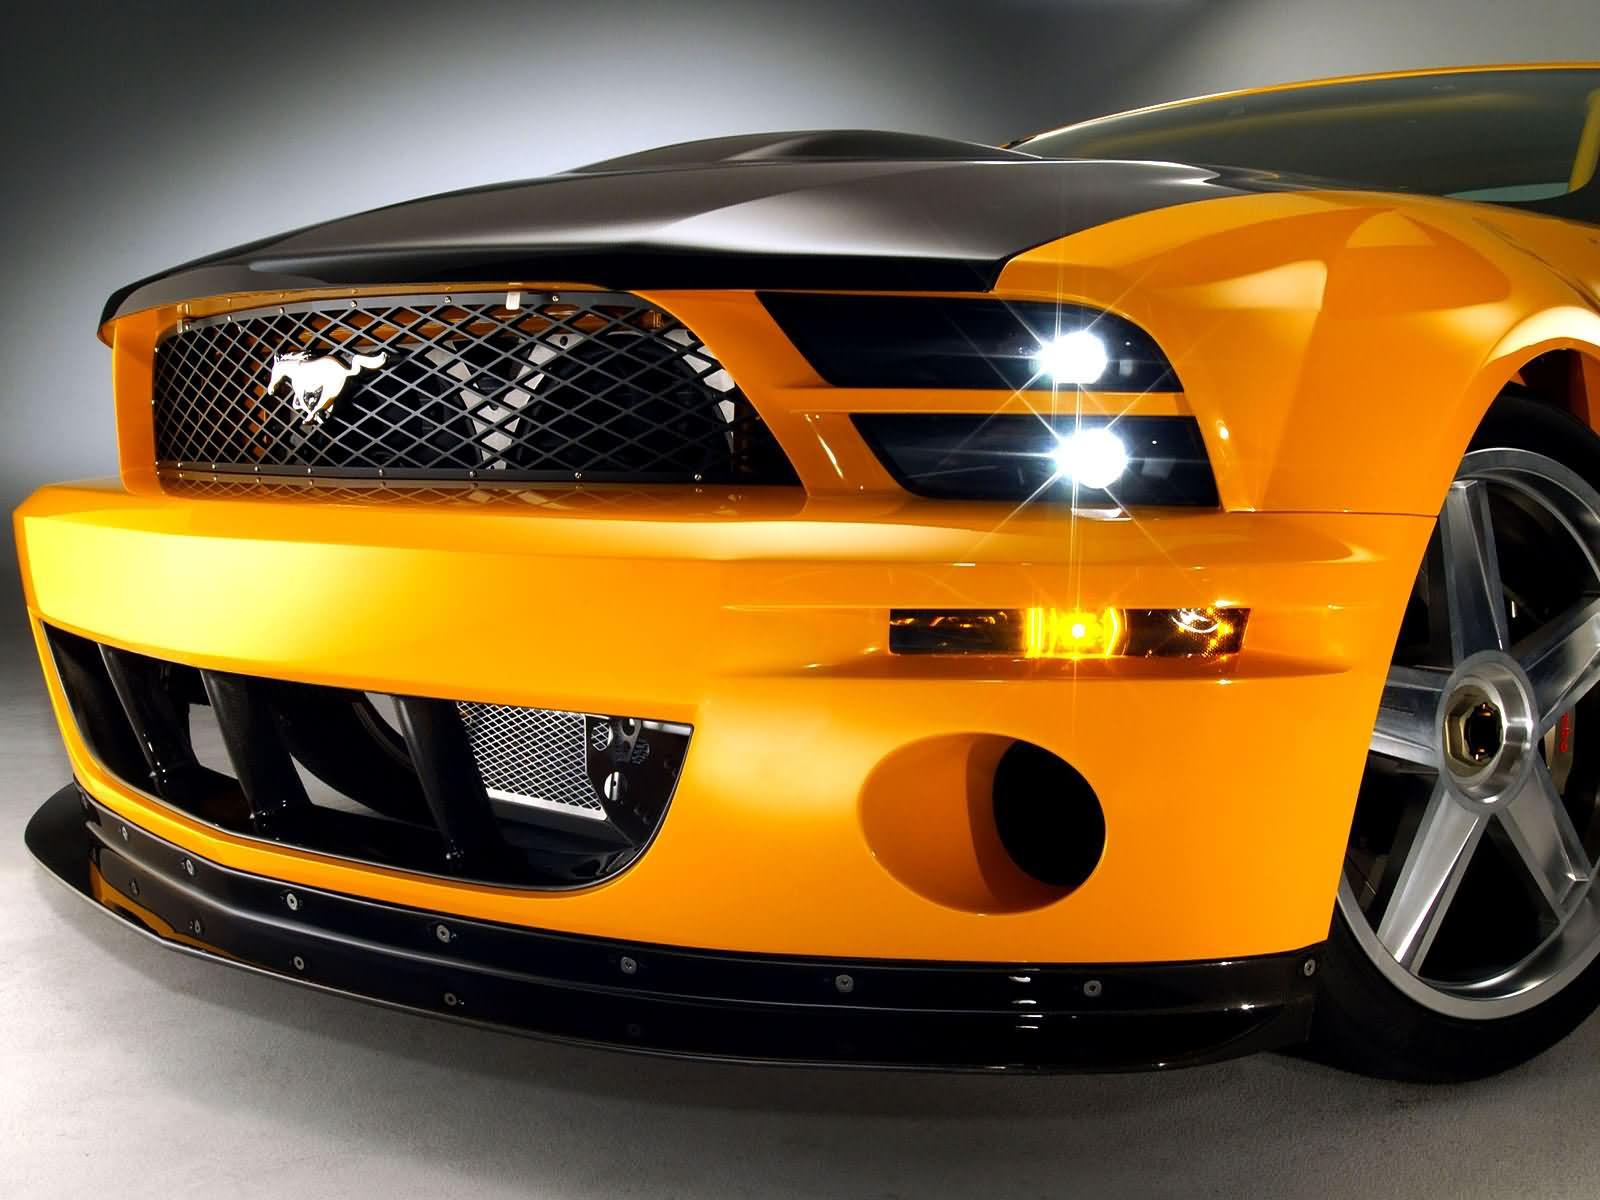 Ford Mustang GT Wallpaper 1600x1200